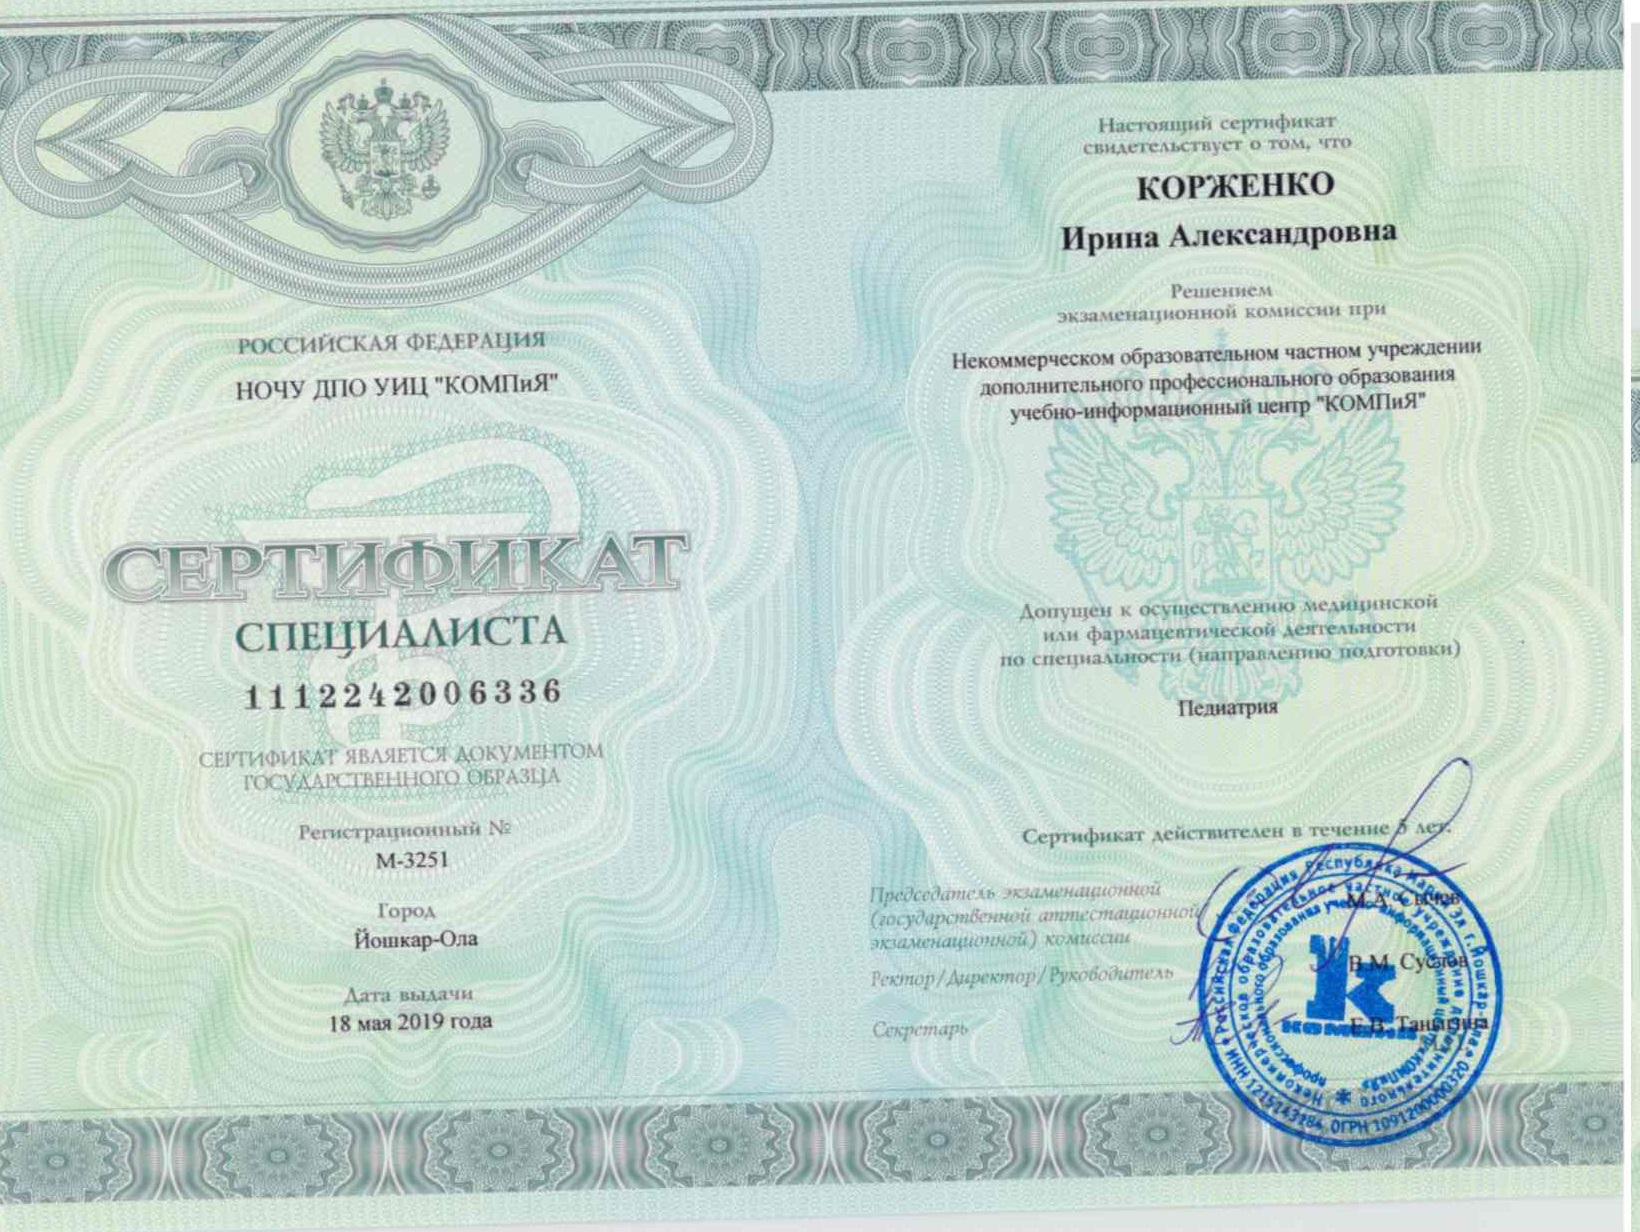 сертификат педиатр